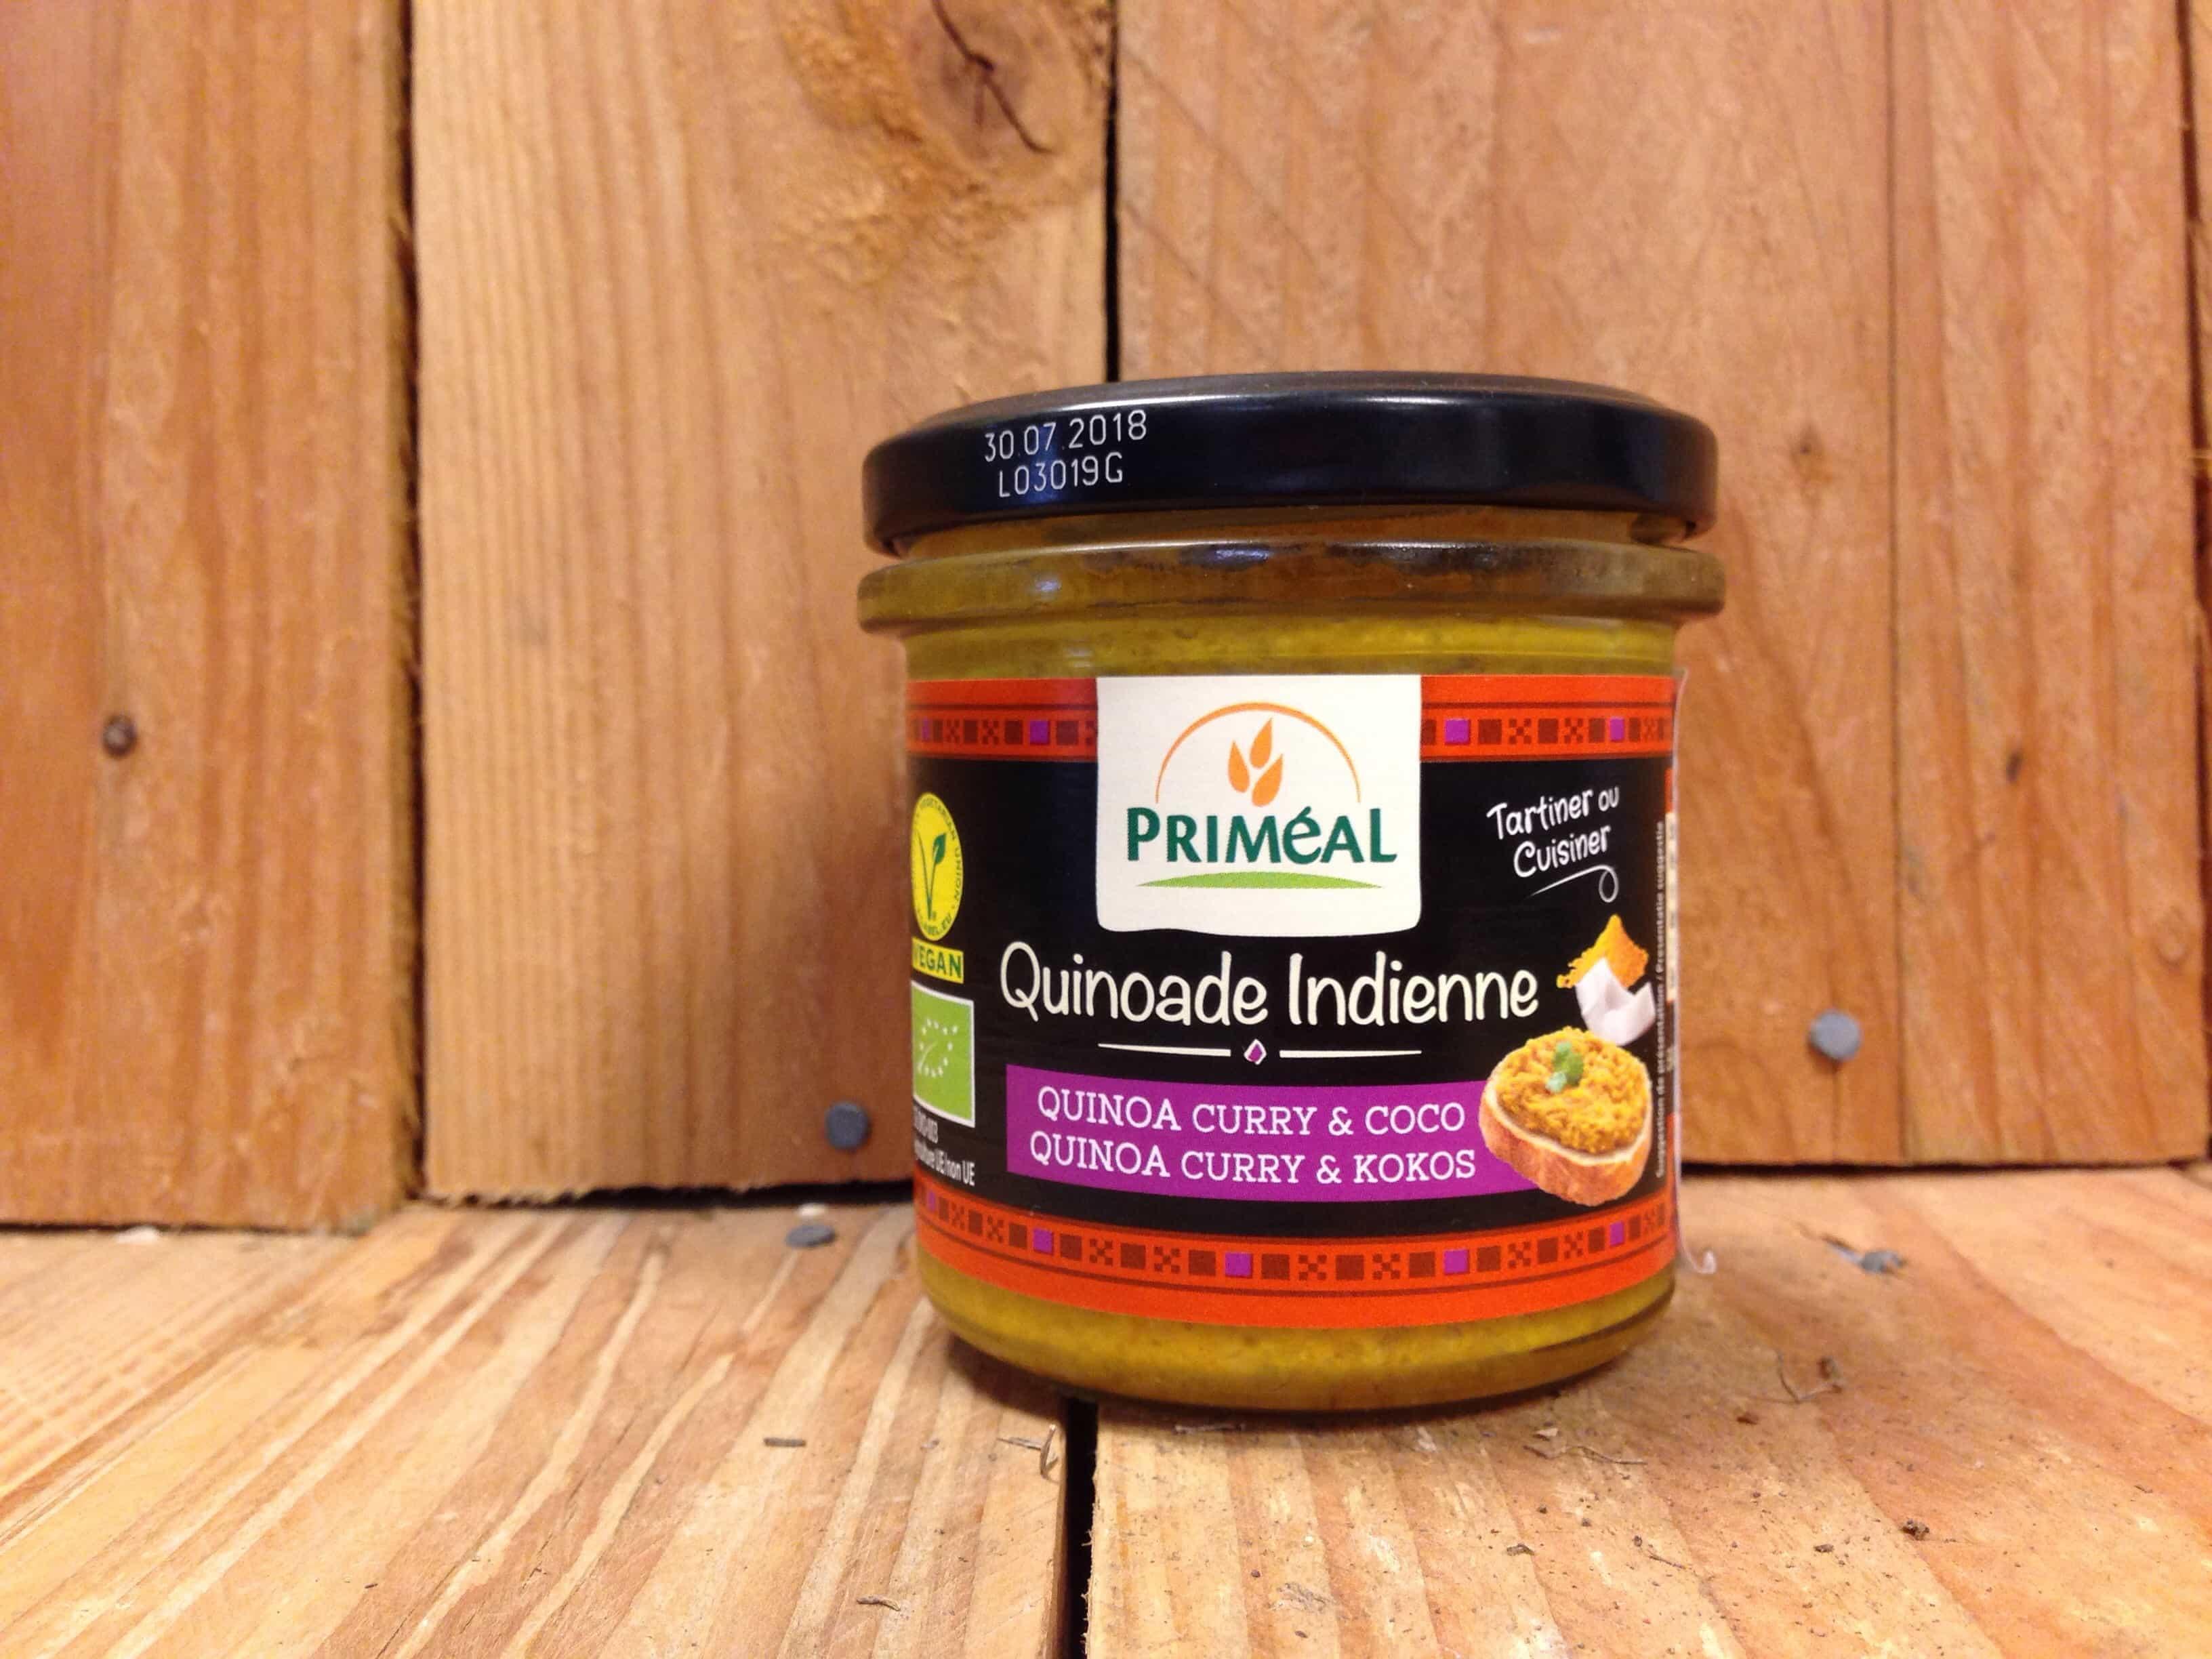 Primeal – Spreadable Dip – Indian Quinoa Curry & Coco (140g)